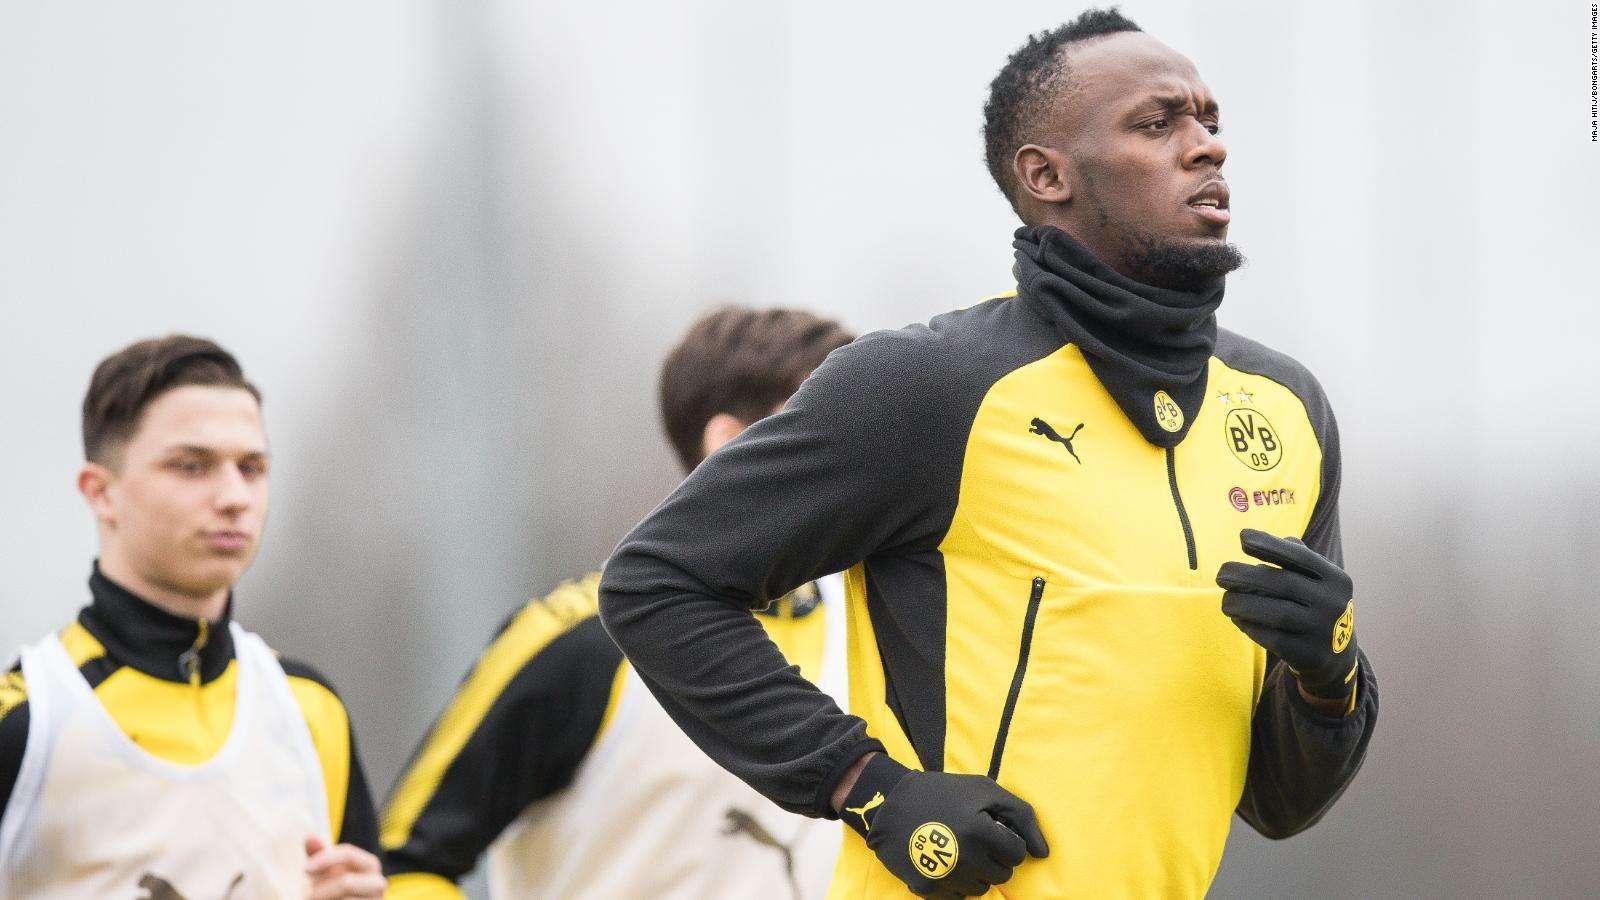 Bolt Returning to Dortmund for 3 Week Training